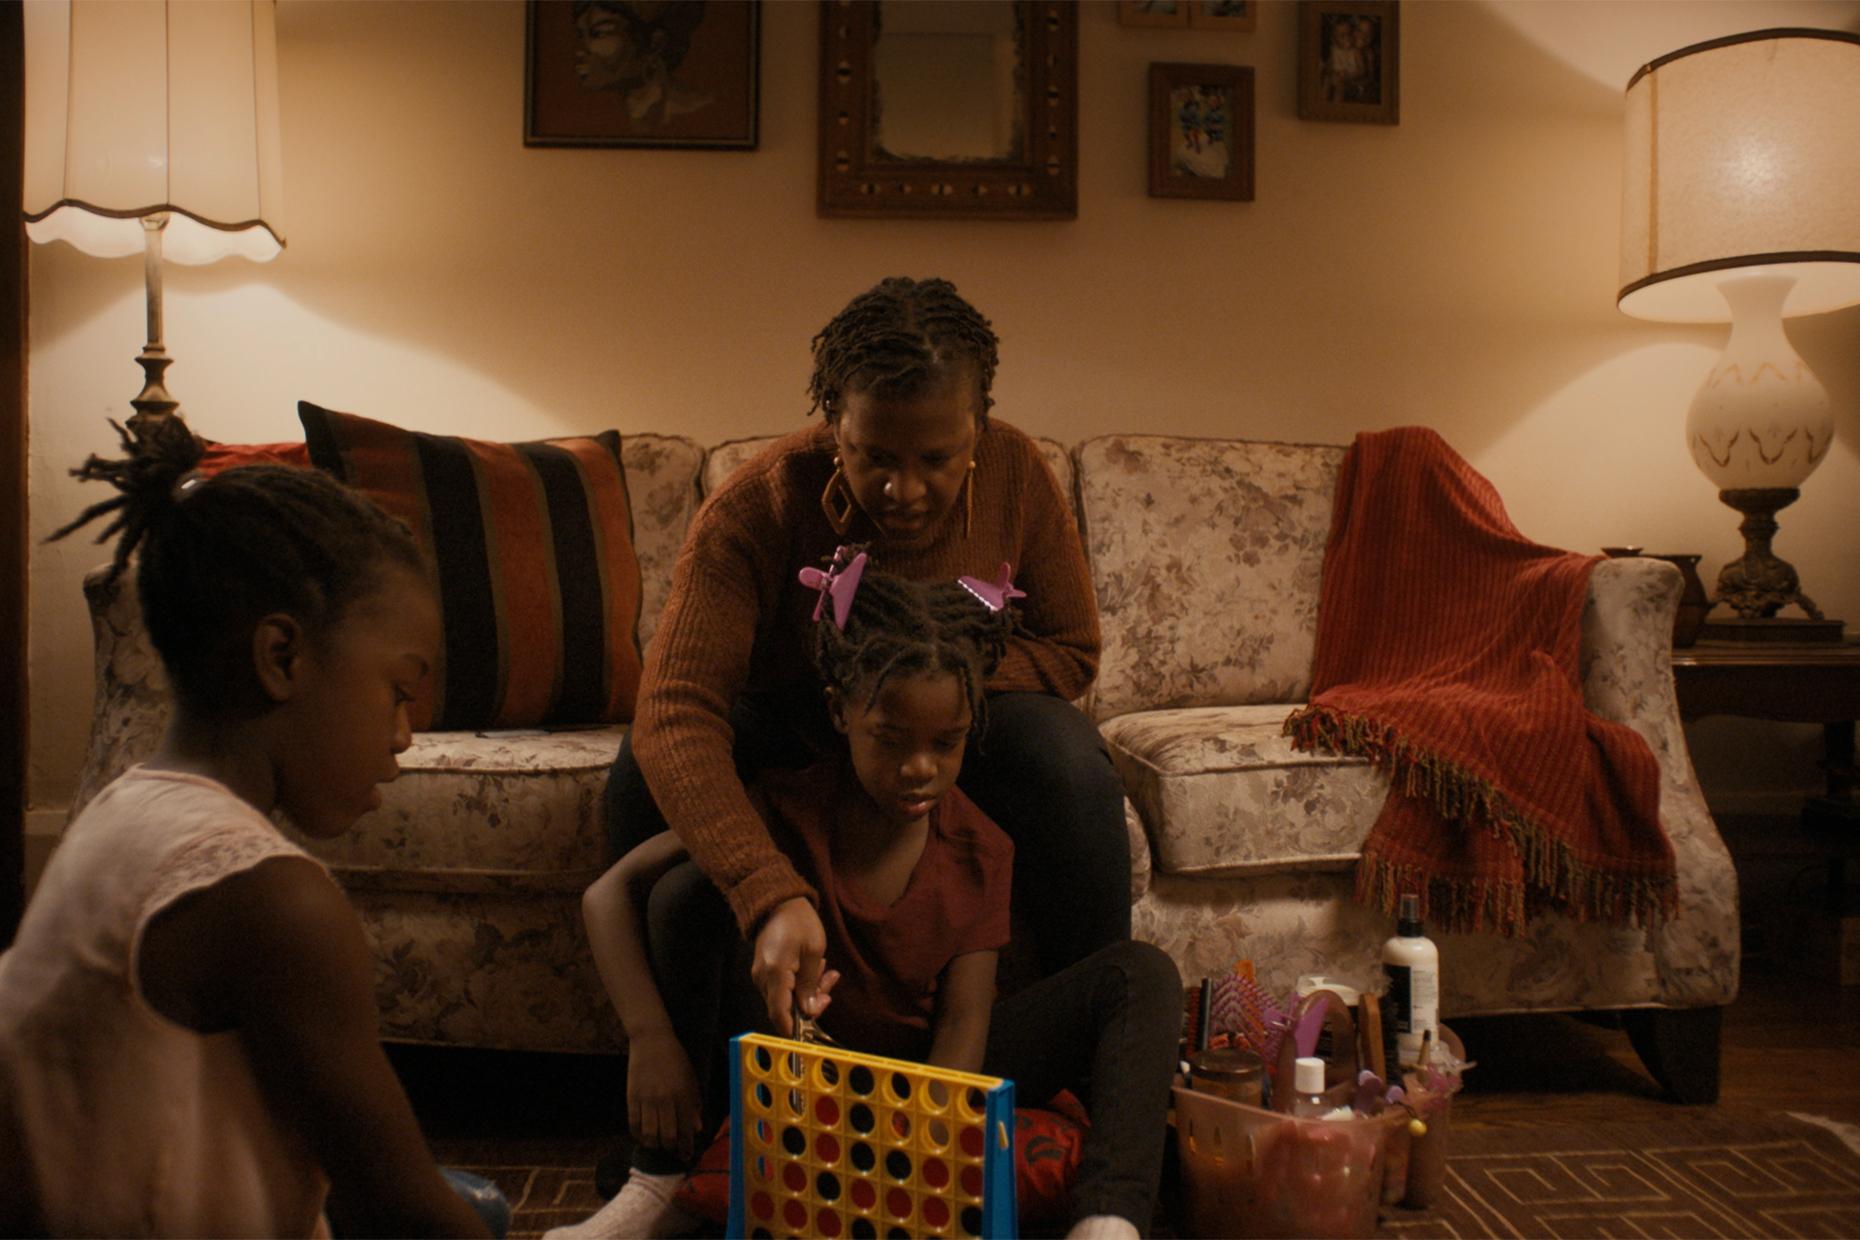 A person sitting in a living room, braiding a kid's hair.